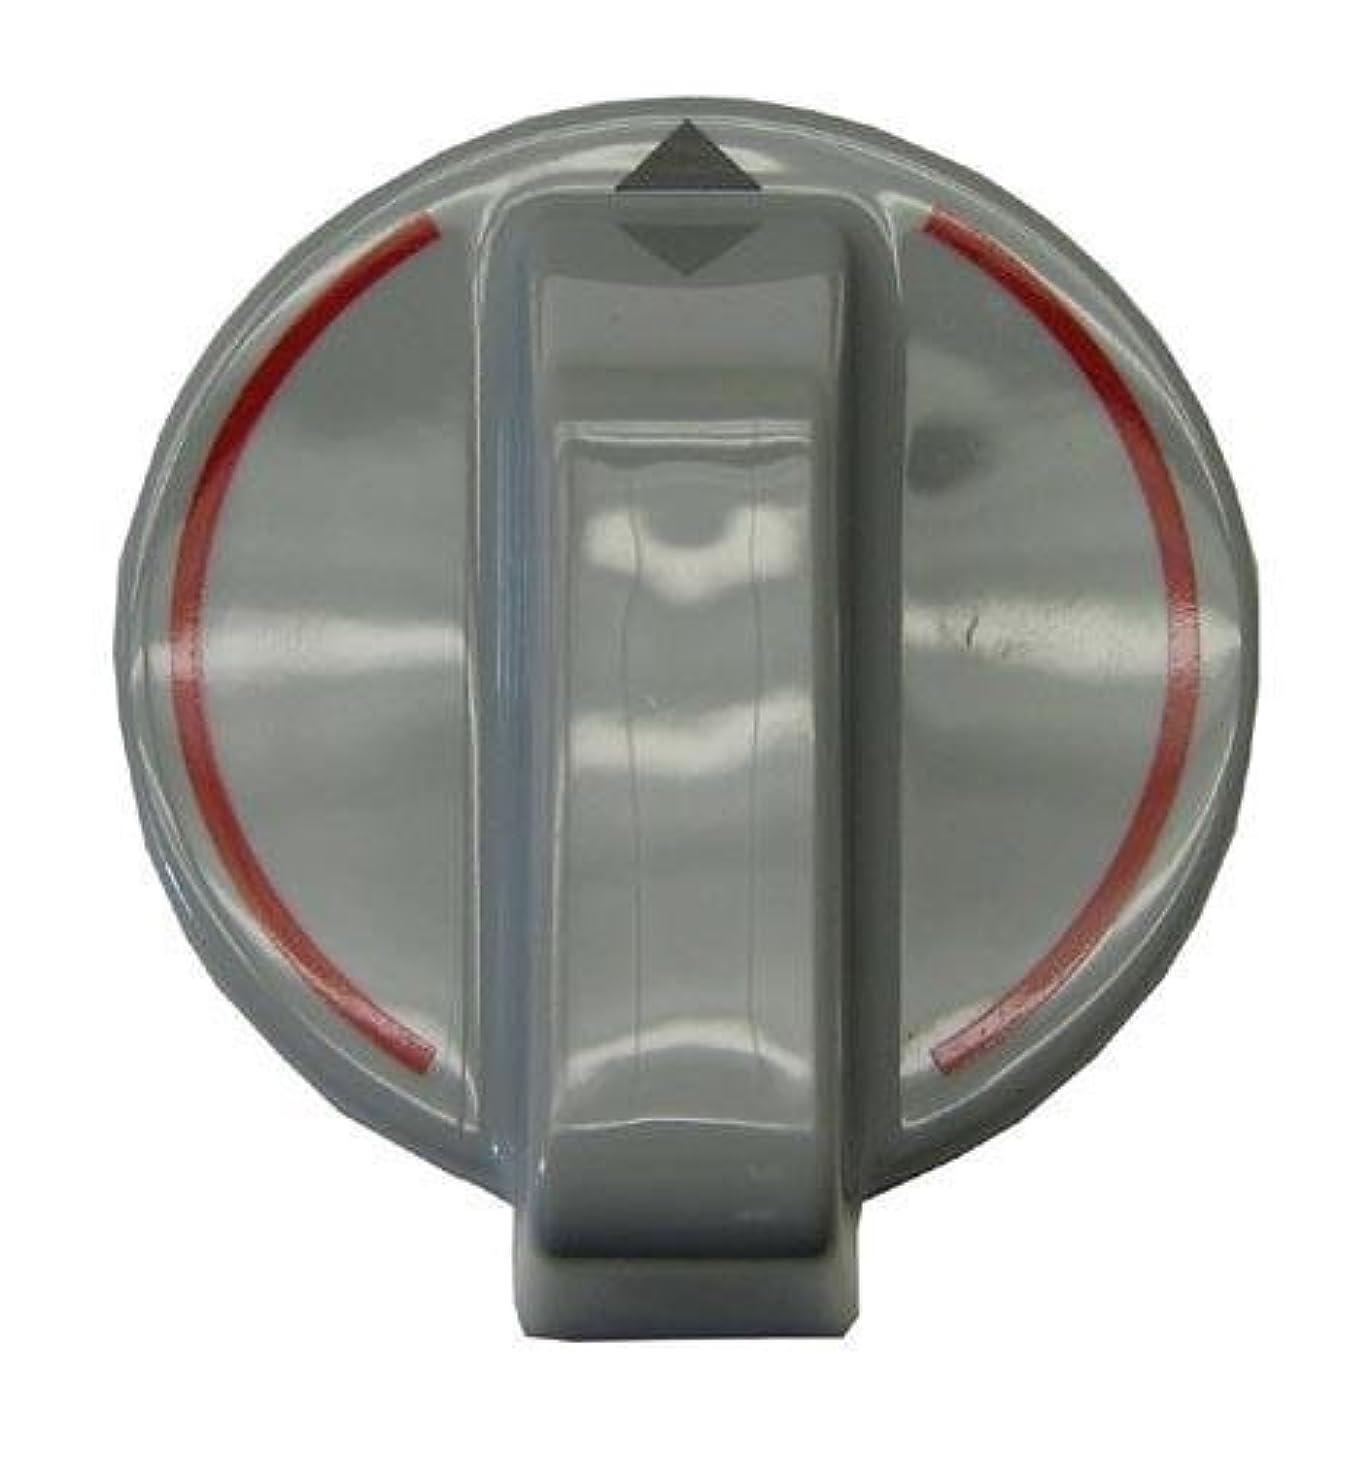 APW (American Permanent Ware) 8705800 Knob Grey Pointer 2-1/2